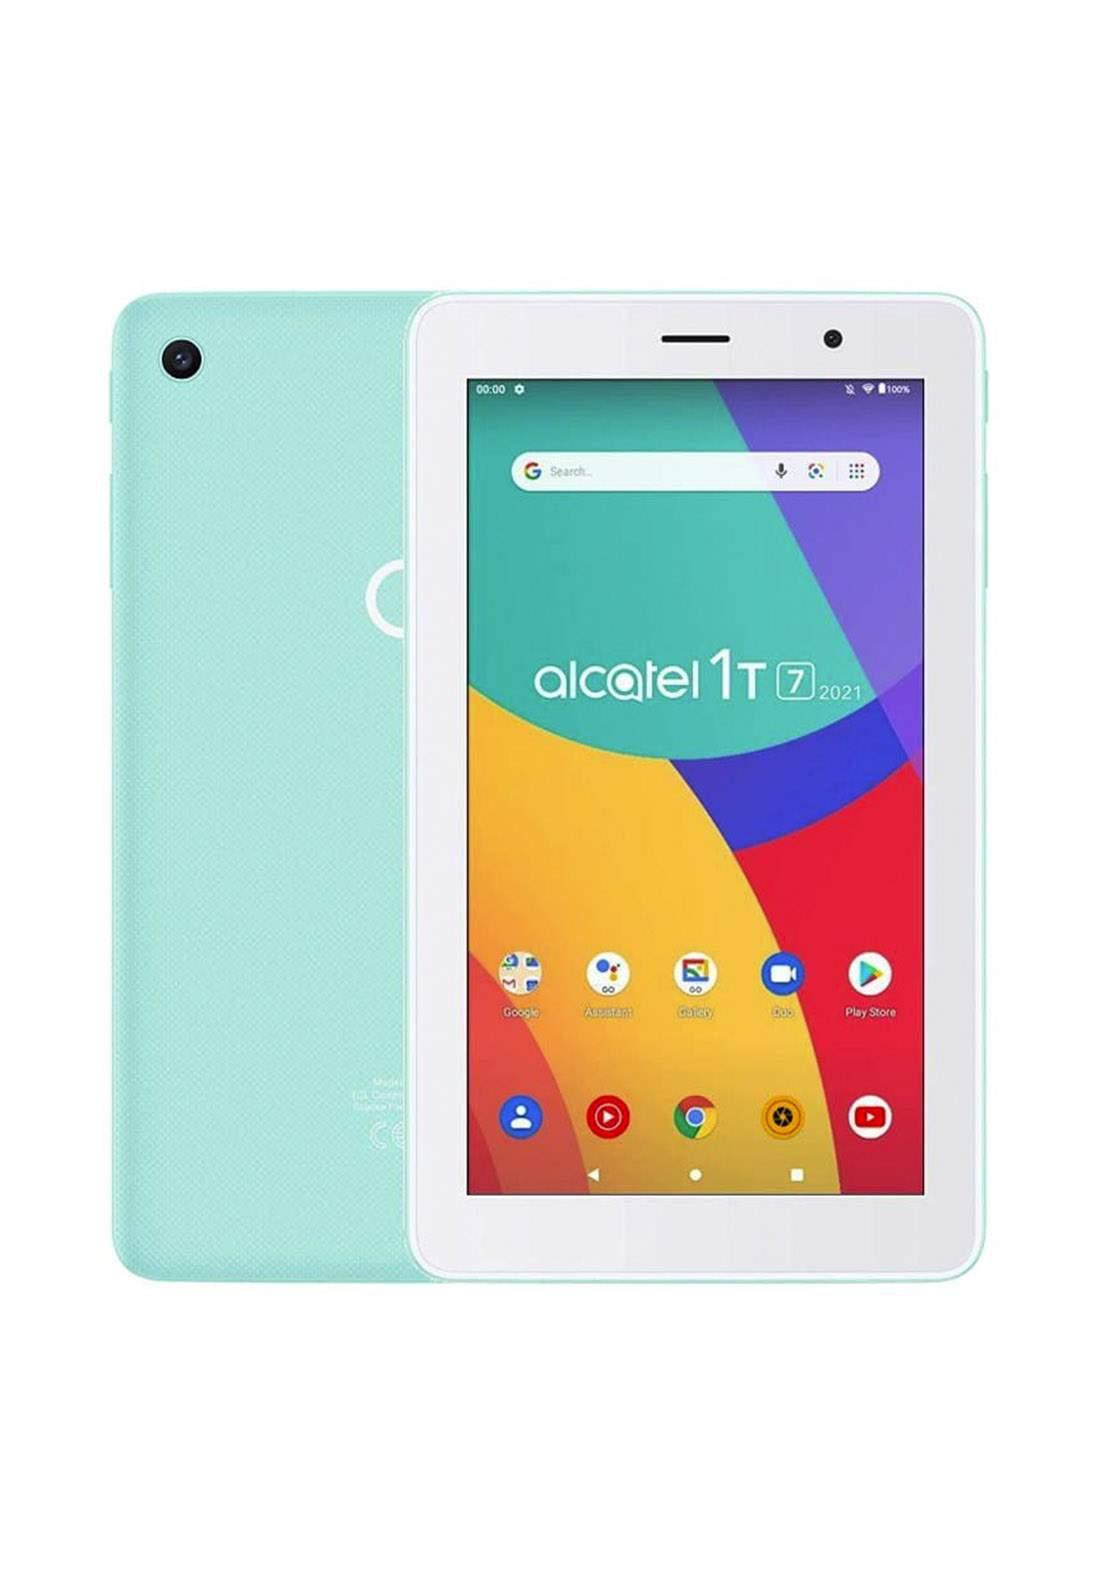 ALCATEL 1T 7 9309X1 WiFi 1GB RAM 8GB With Flip Cover - Cream Mint